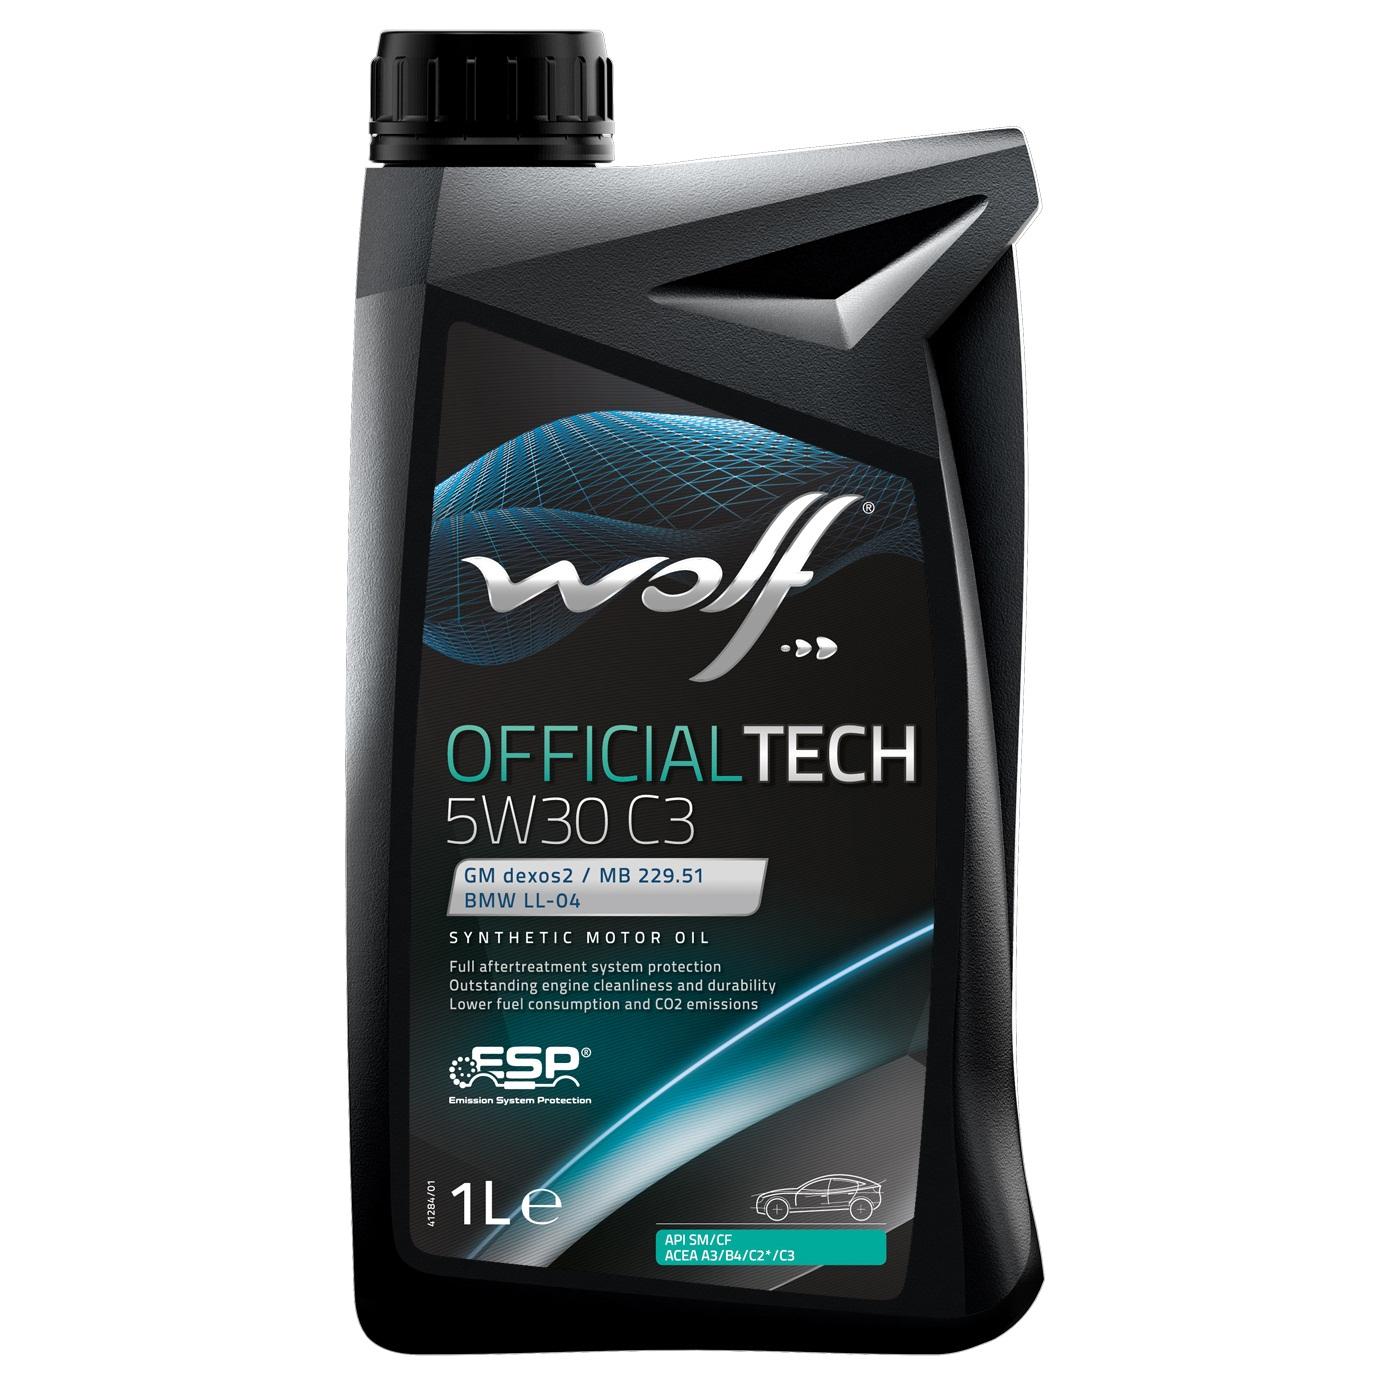 ULEI MOTOR WOLF OFFICIALTECH C3 5W30 1L